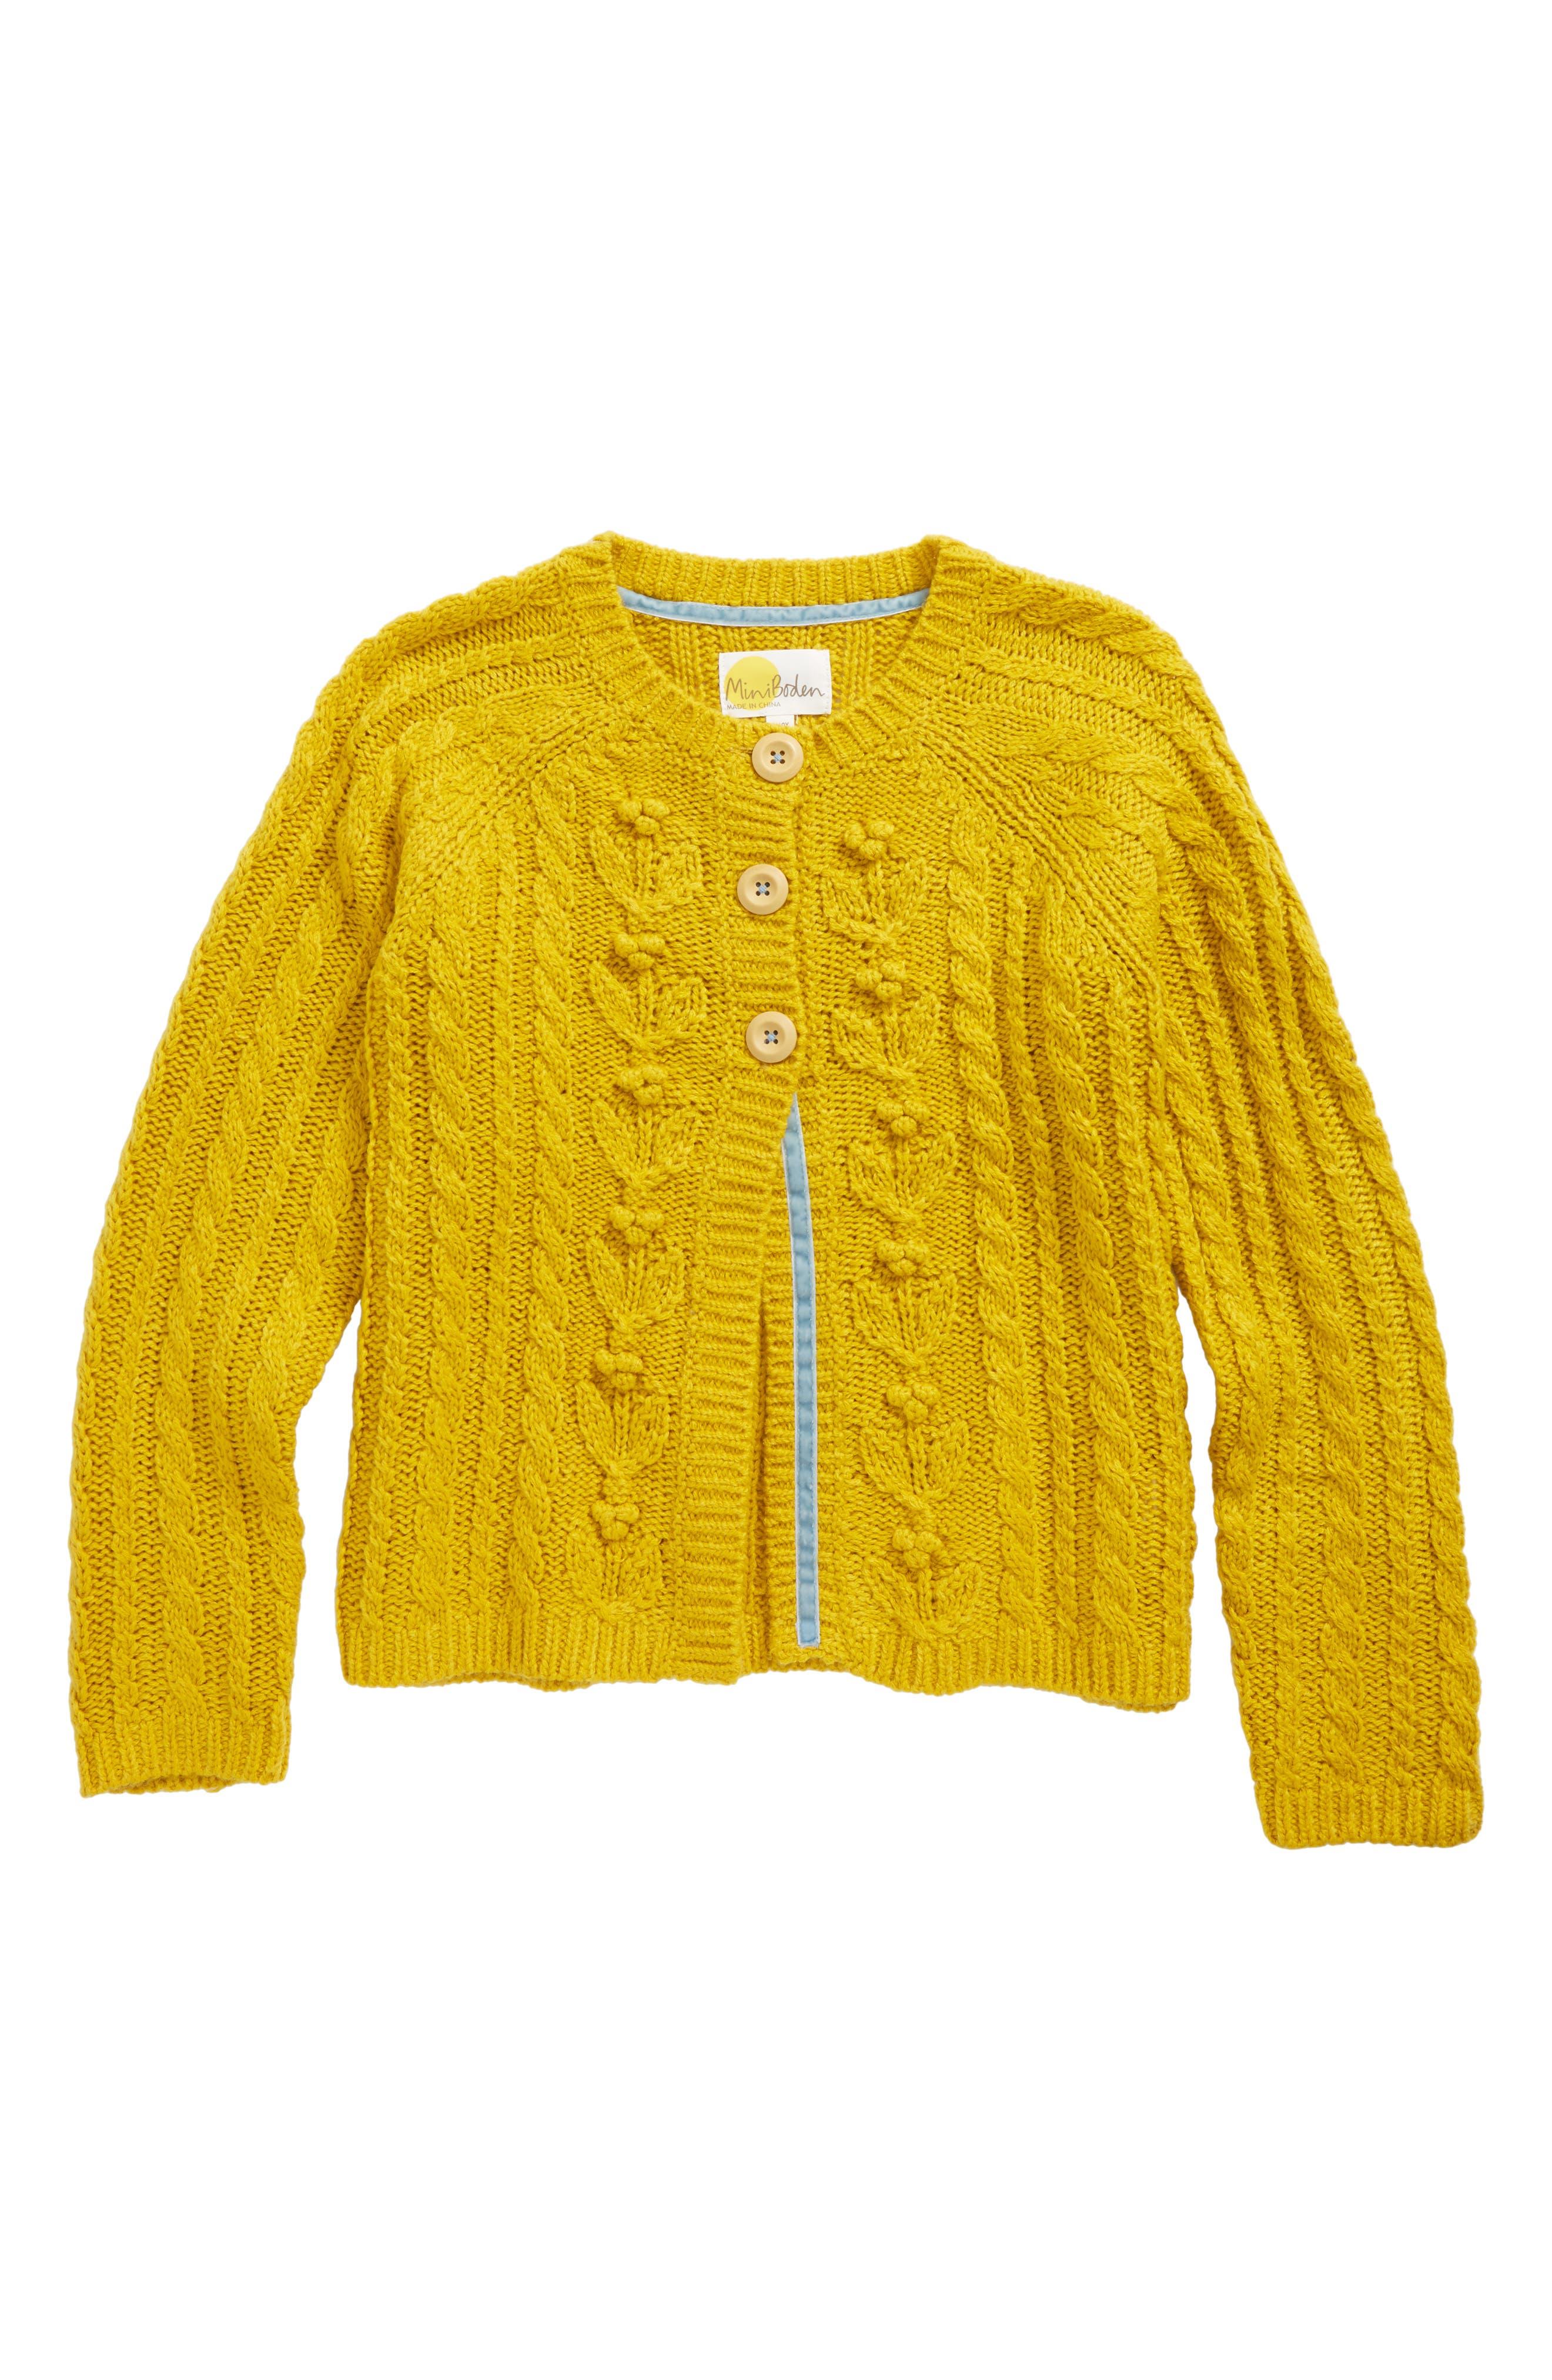 Main Image - Mini Boden Cable Knit Cardigan (Toddler Girls, Little Girls & Big Girls)